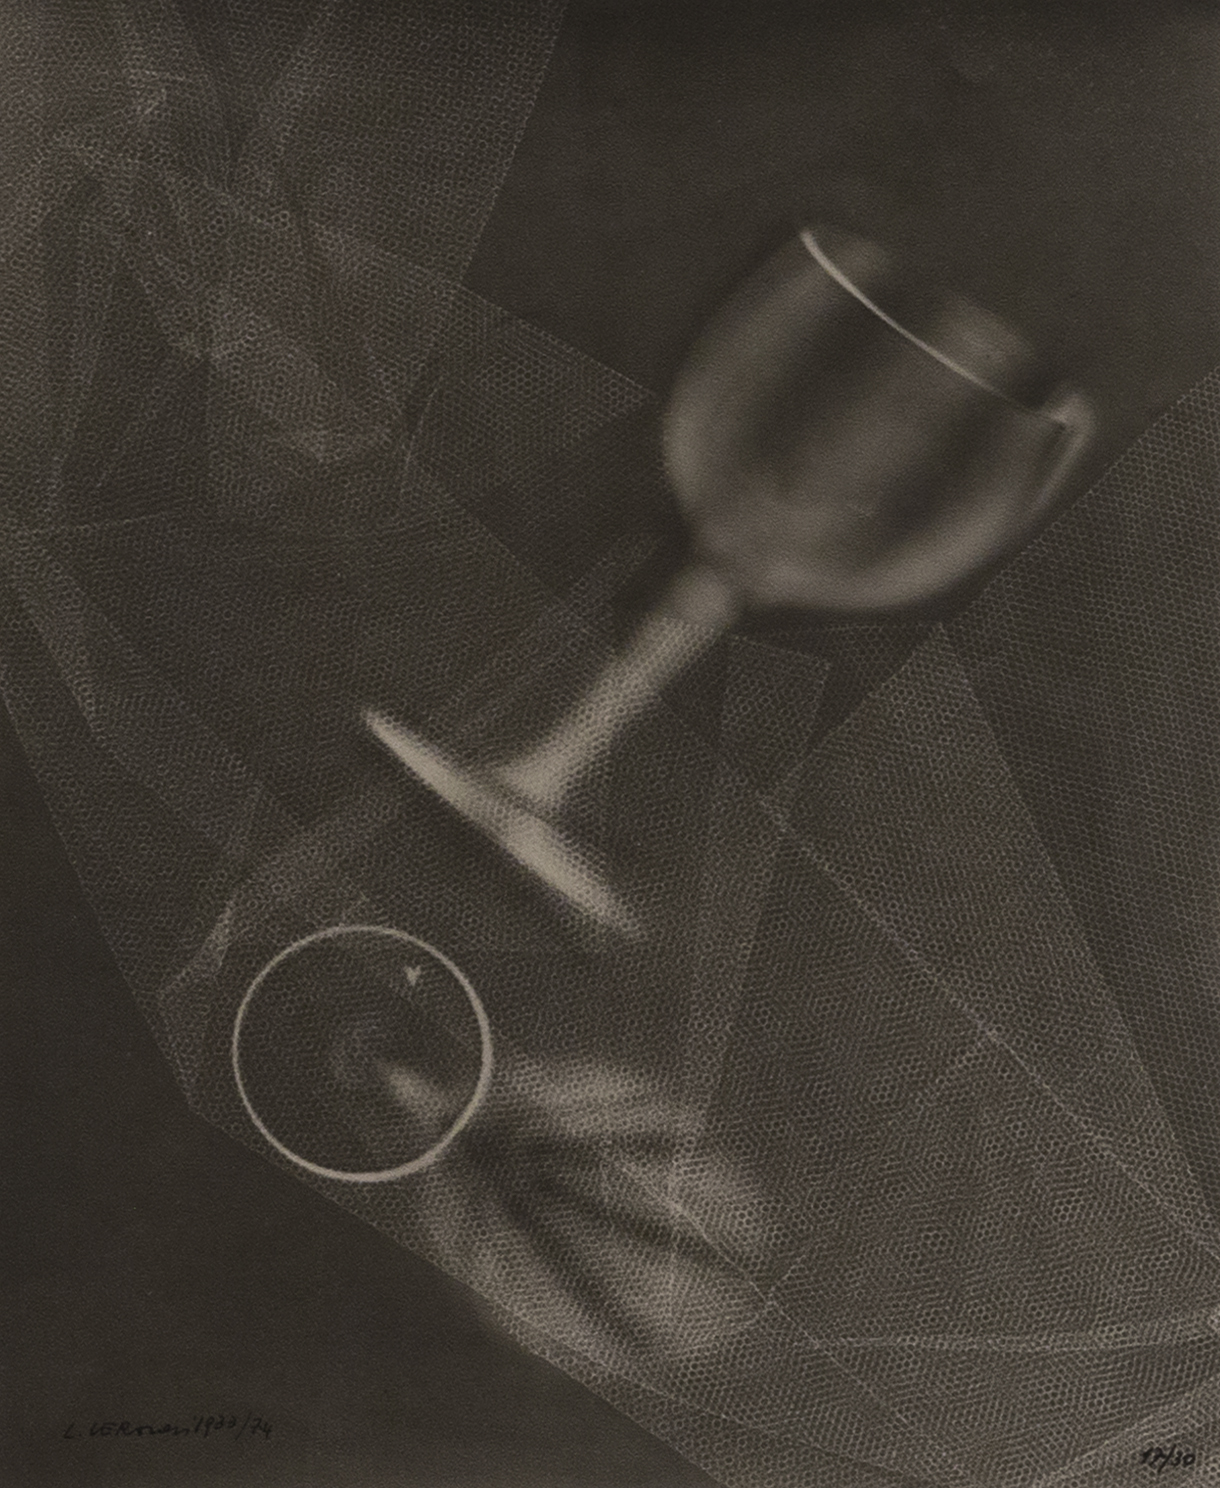 Fotogramma, 1933-1940